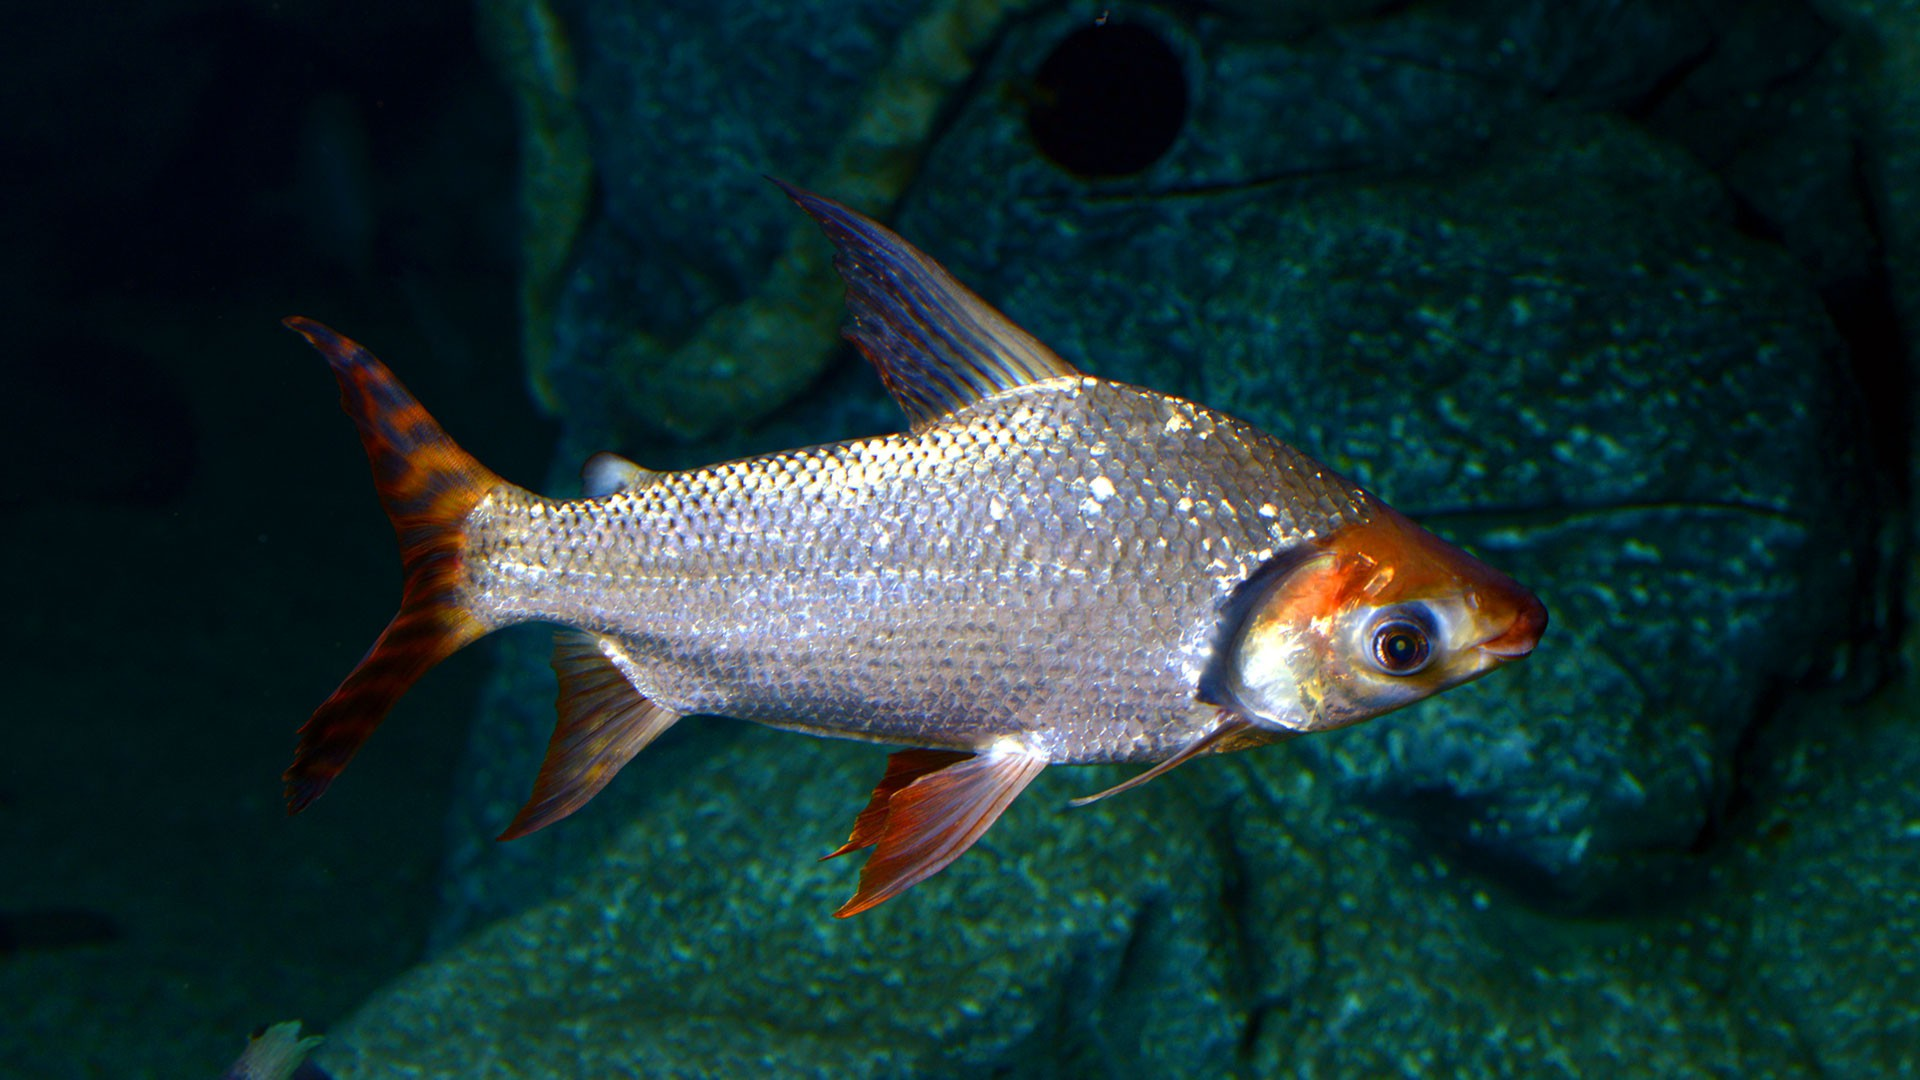 Semaprochilodus